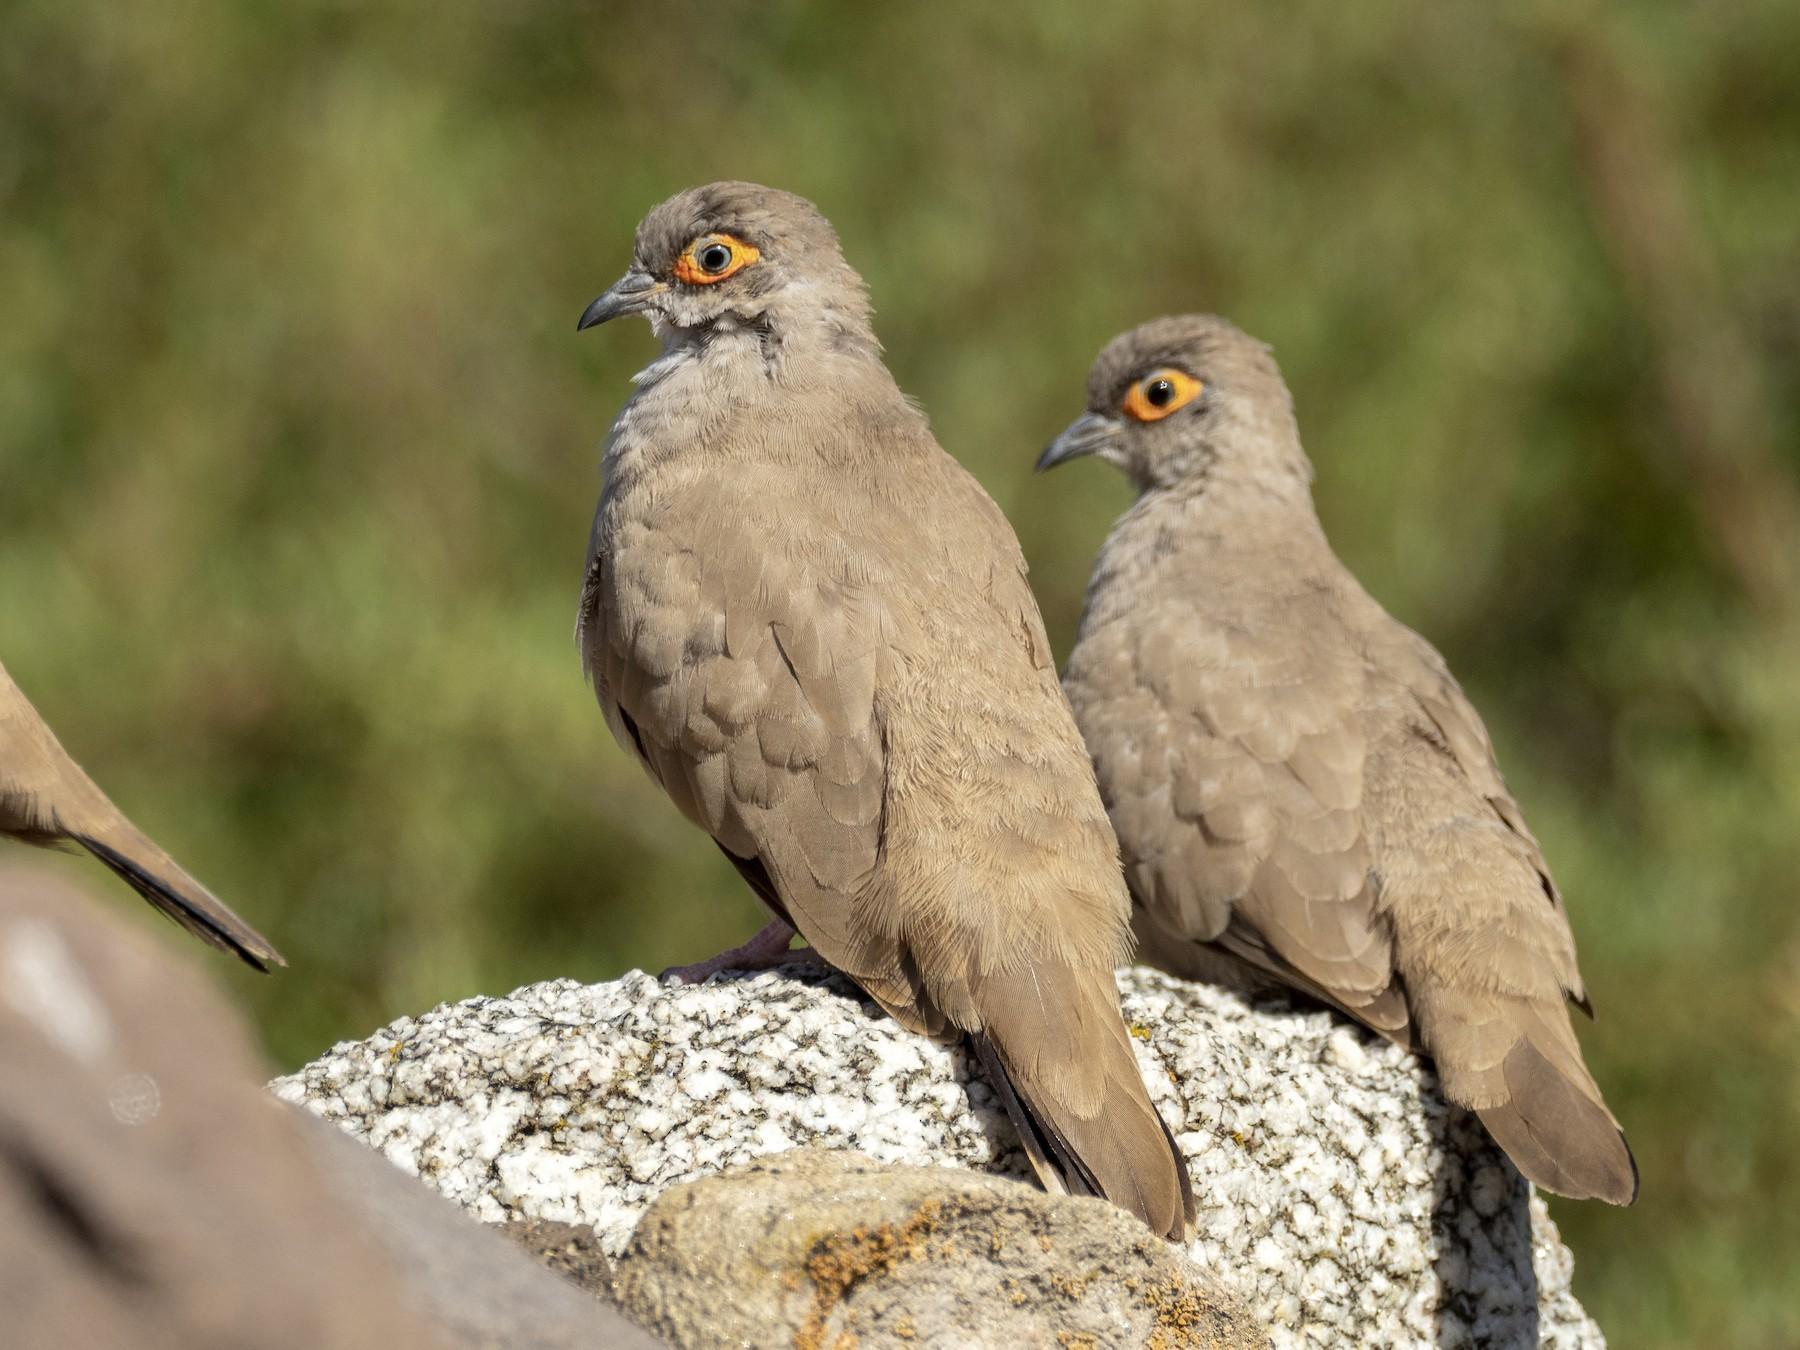 Bare-eyed Ground Dove - Andres Vasquez Noboa - Tropical Birding Tours